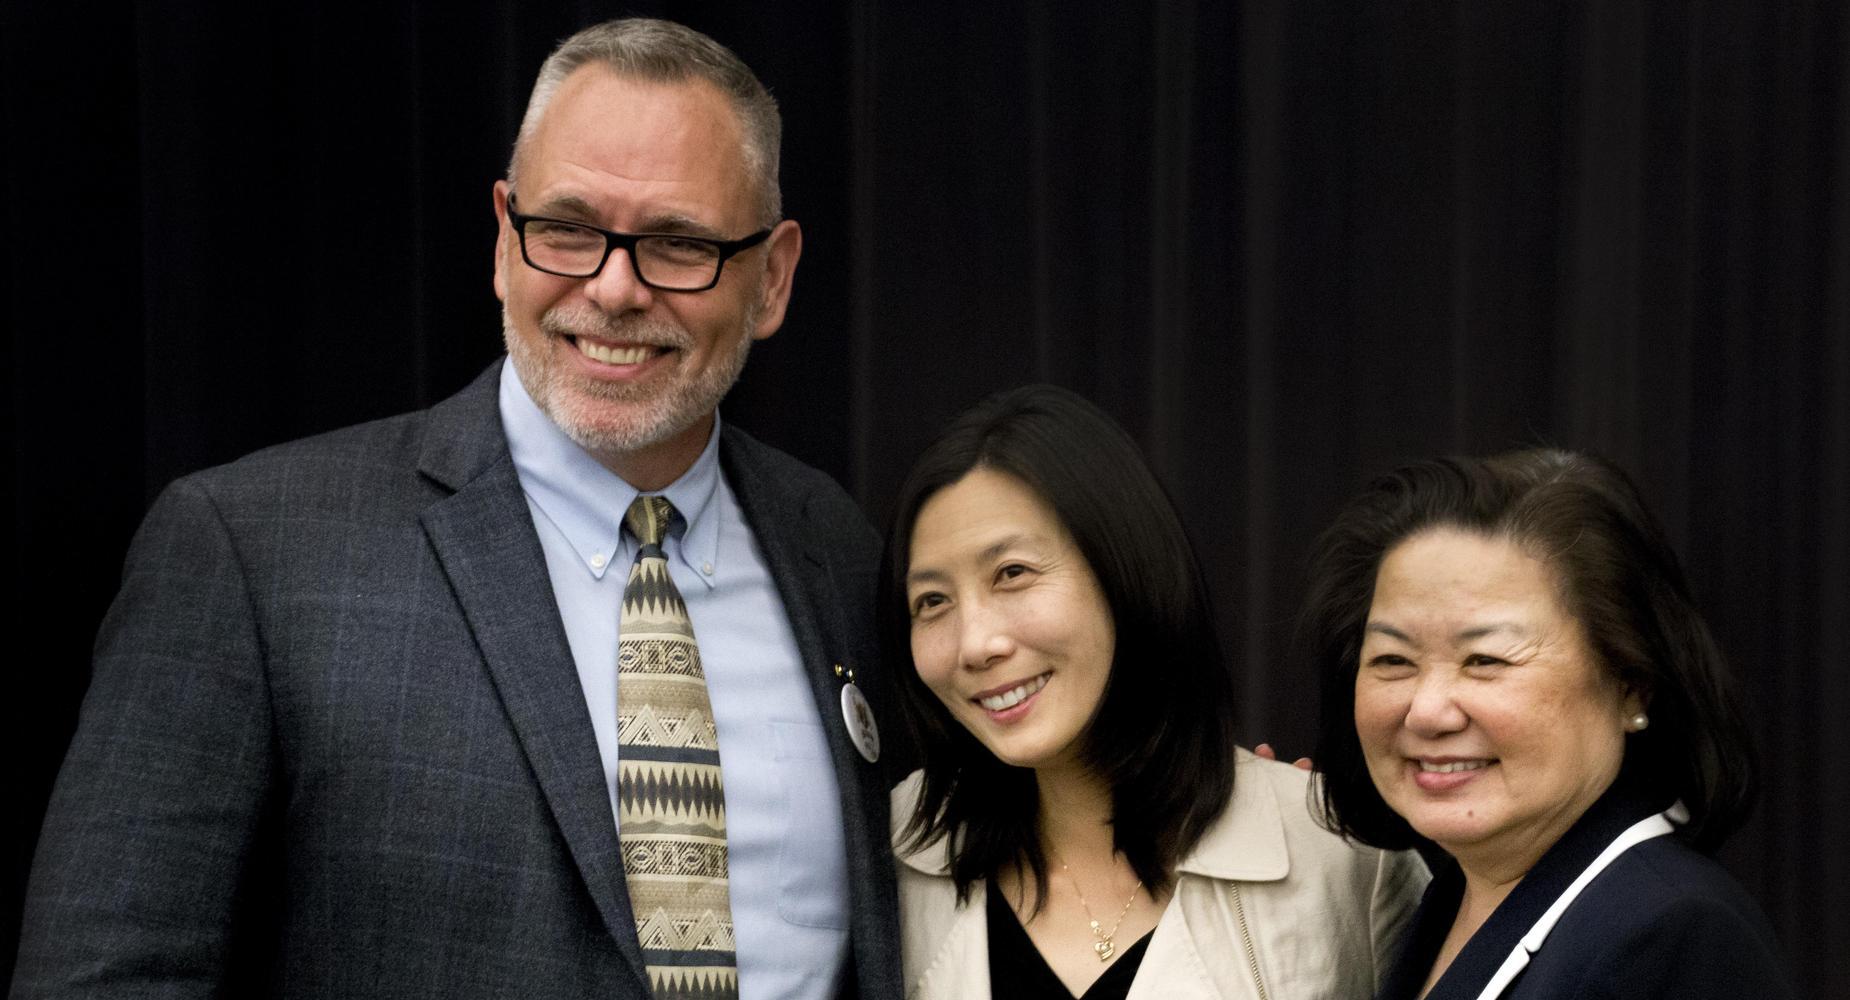 Dr. Sieu, guest speaker, and school principal